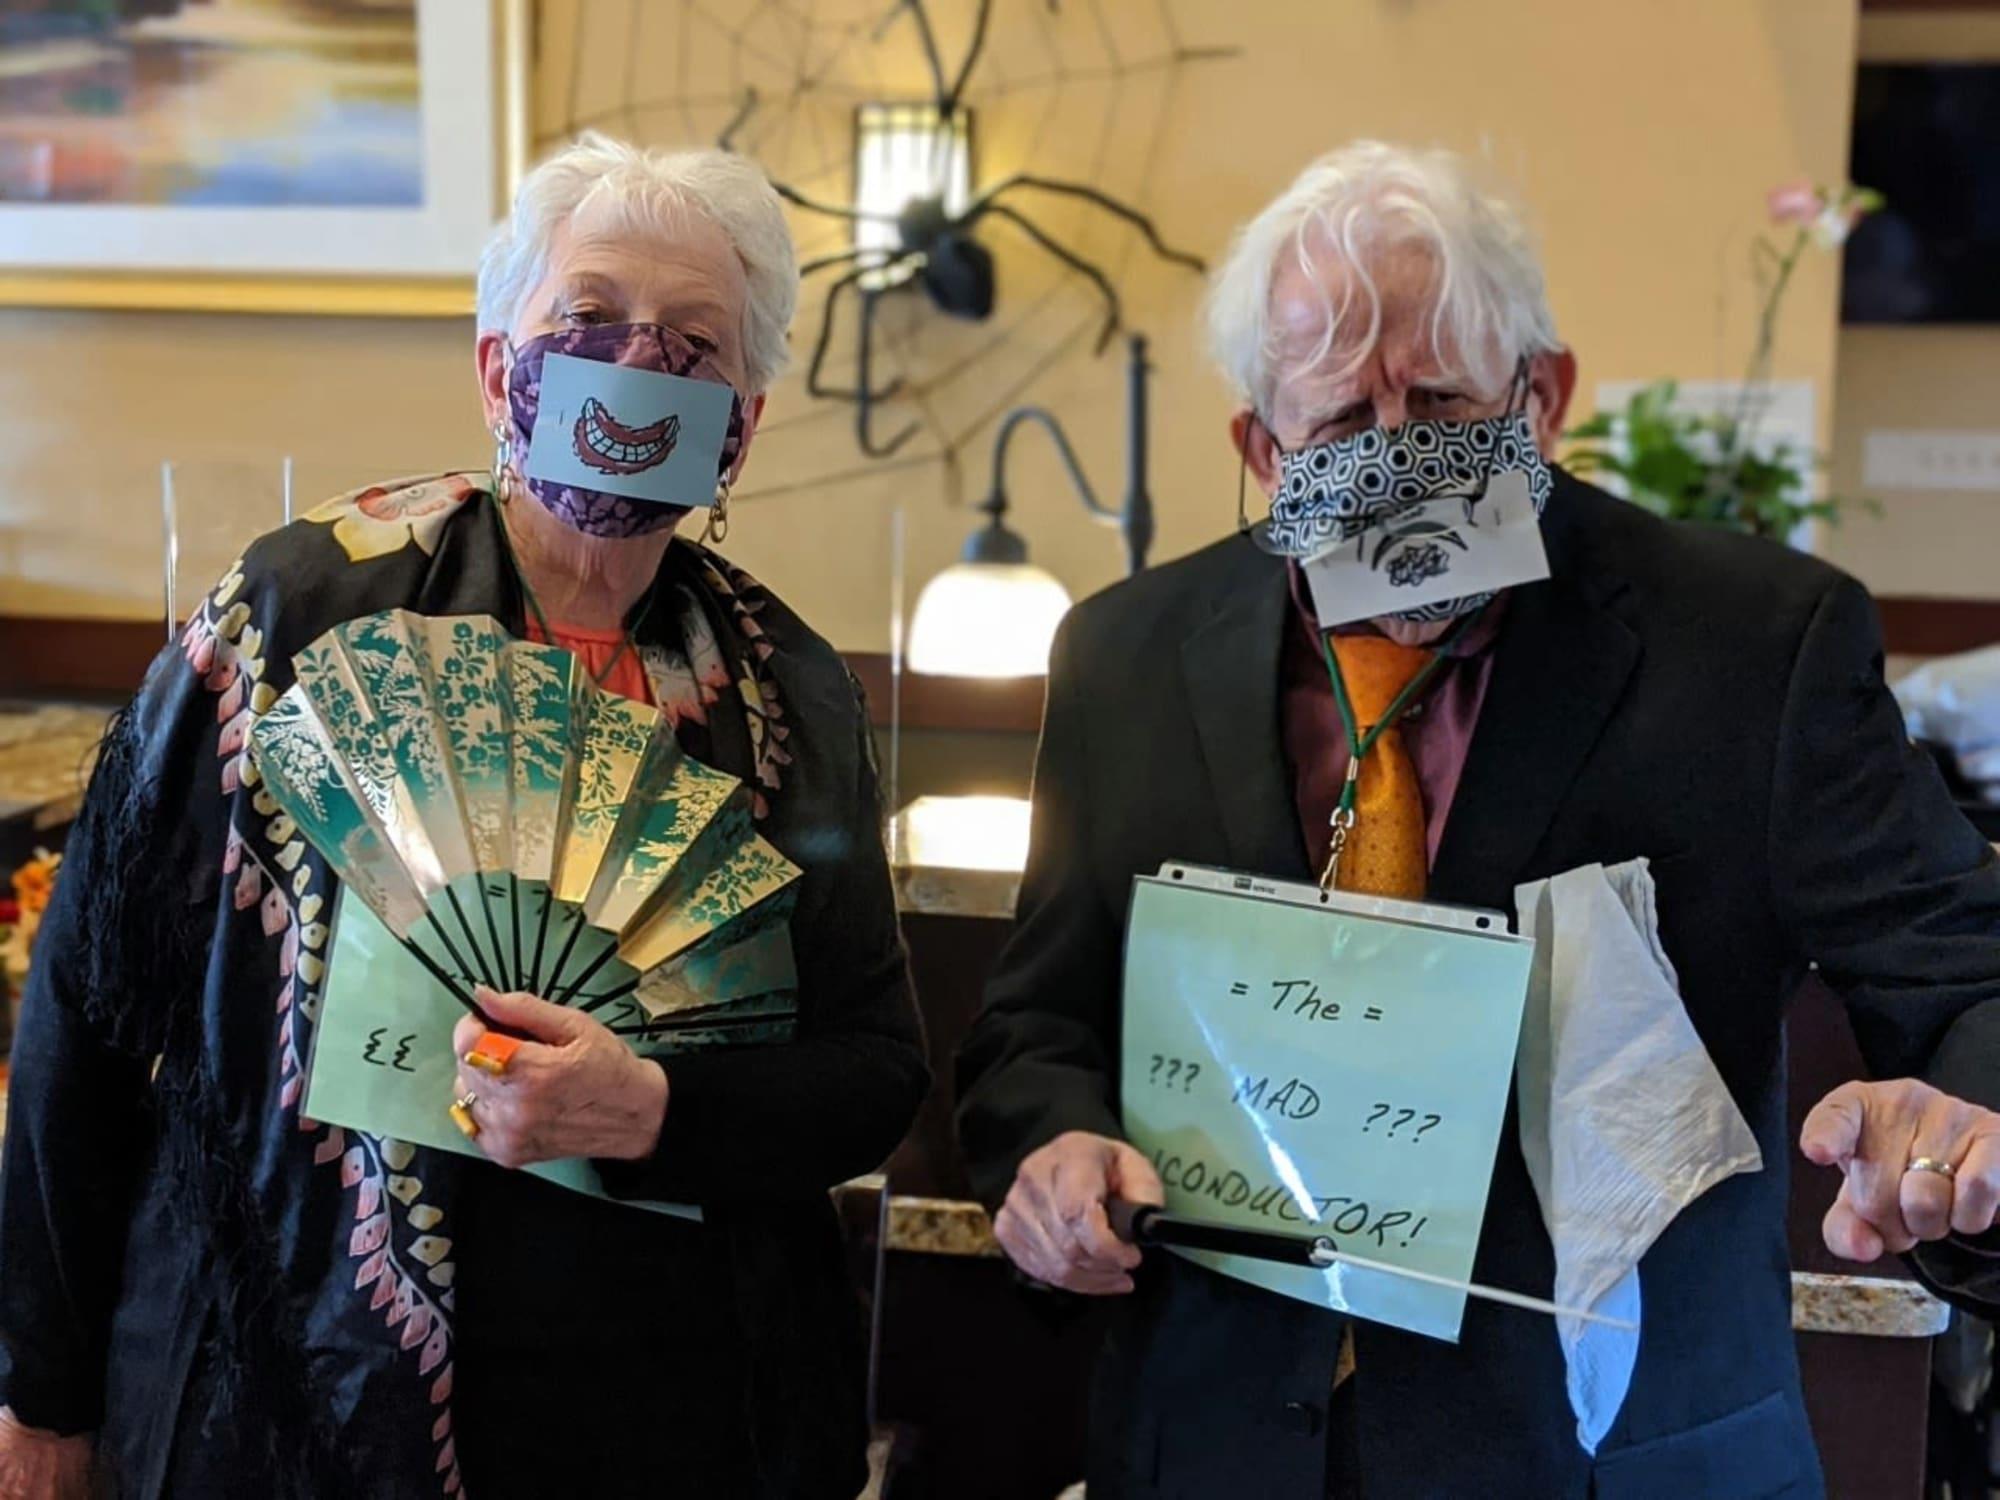 Creative masks at The Wellington in Salt Lake City, Utah